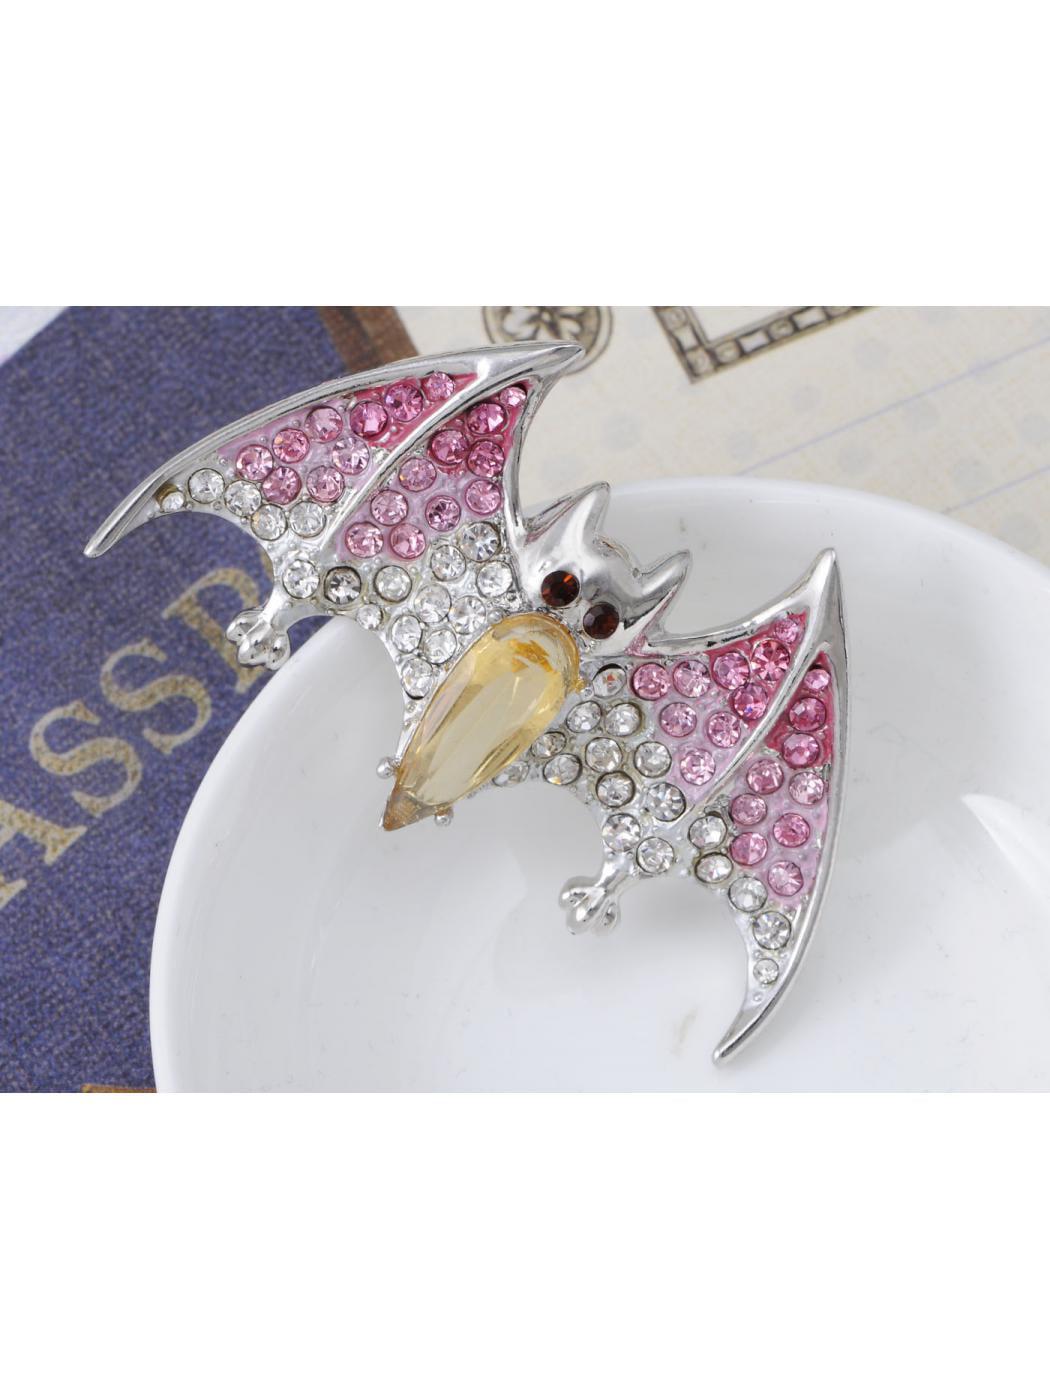 Topaz Crystal Body Rhinestone Painted Fuchsia Pink Wing Vampire Bat Pin Brooch by